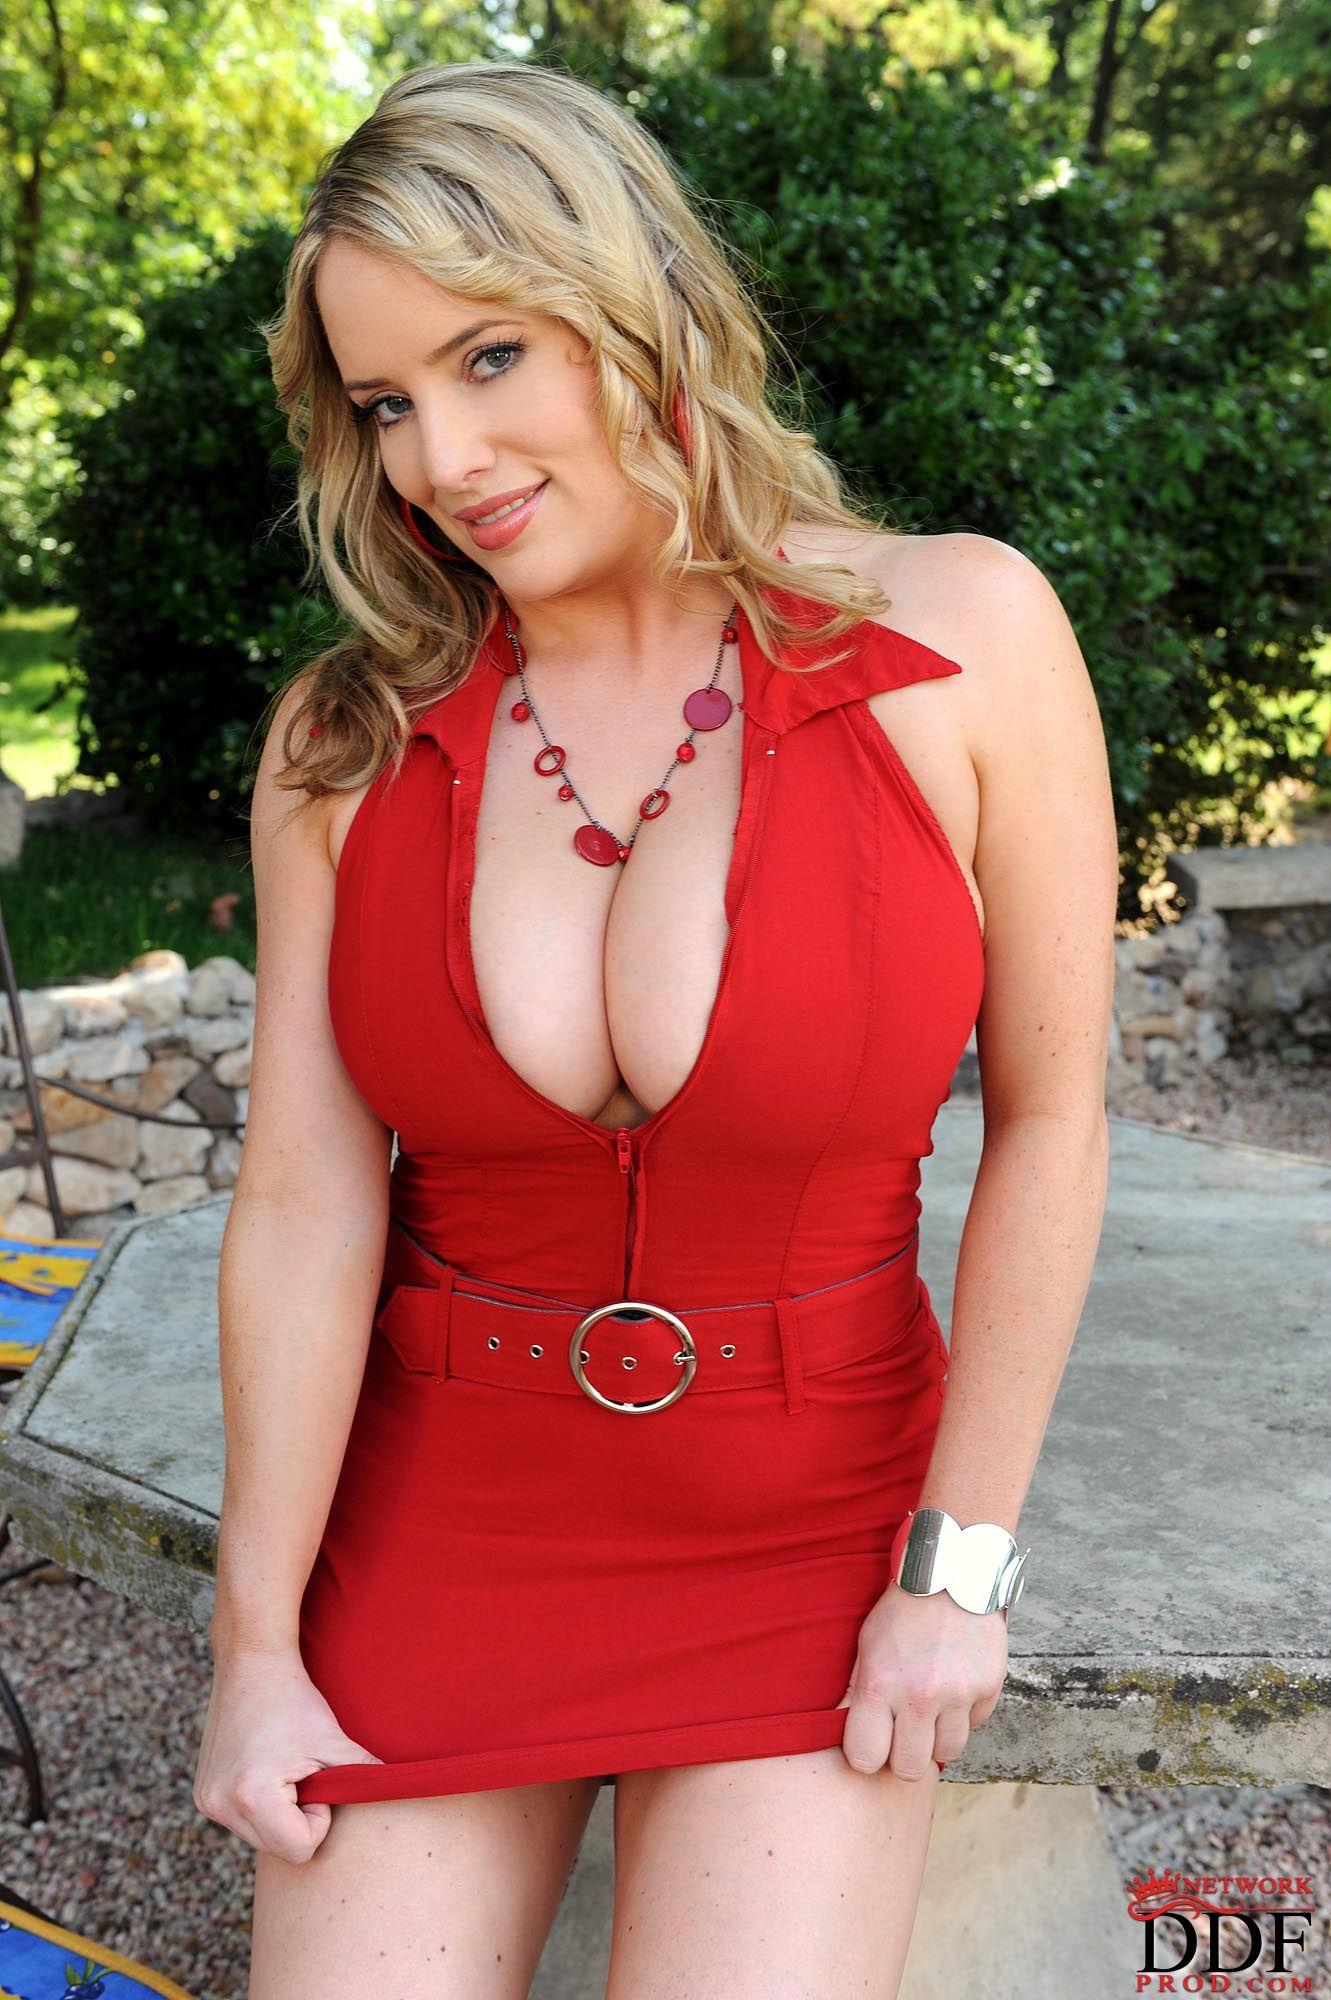 Tiffany Winteler Nude Photos